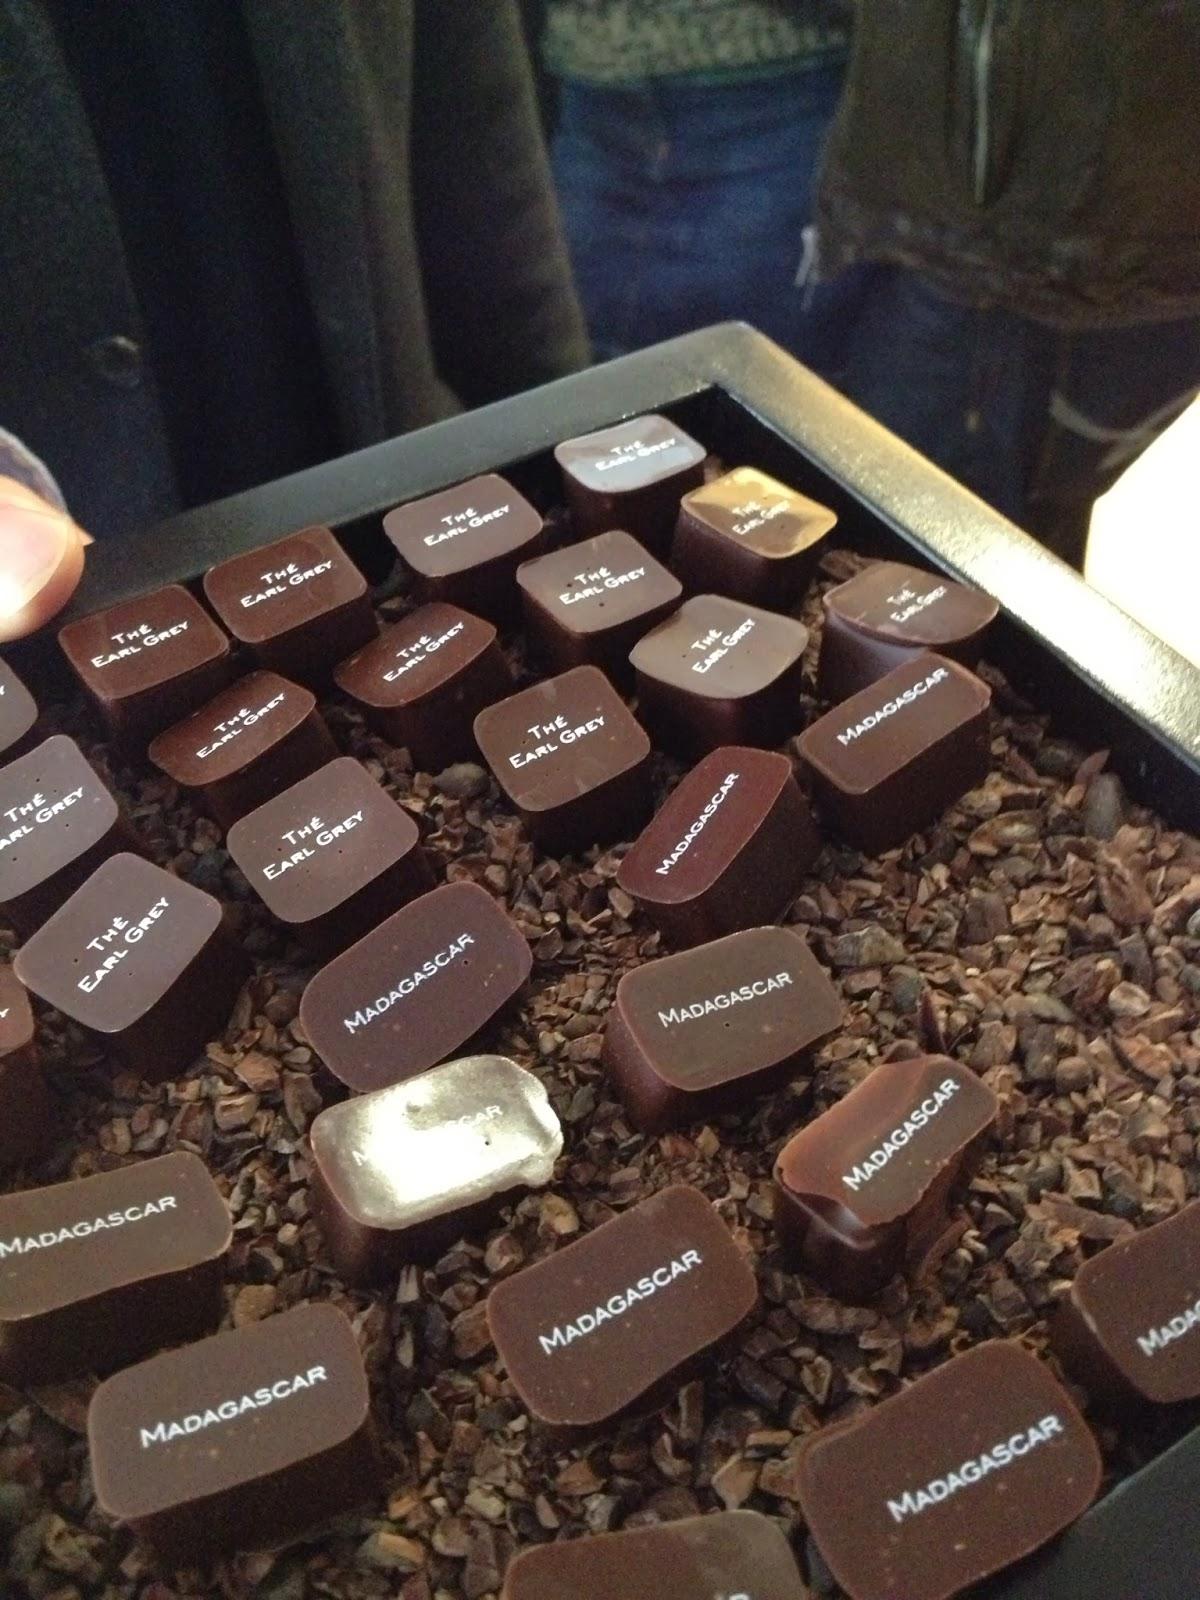 Brussels - Earl Grey and Madagascar chocolates